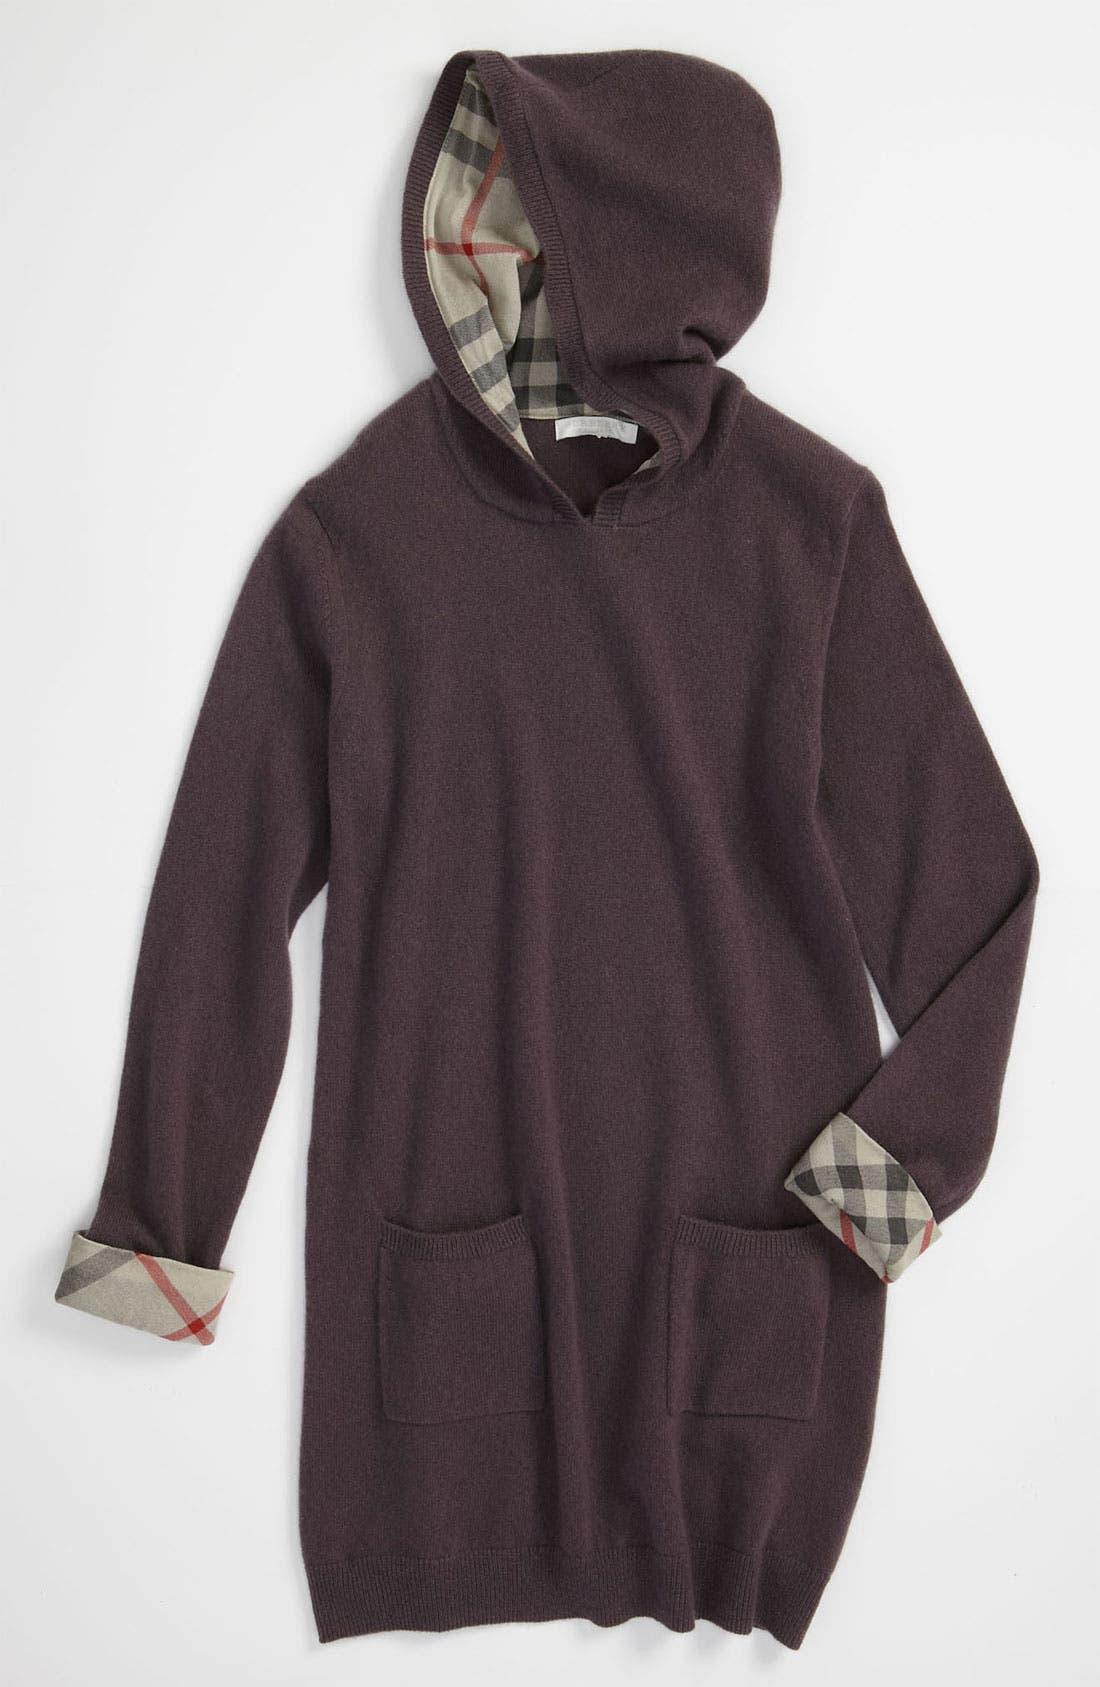 Main Image - Burberry Cashmere Tunic Dress (Big Girls)